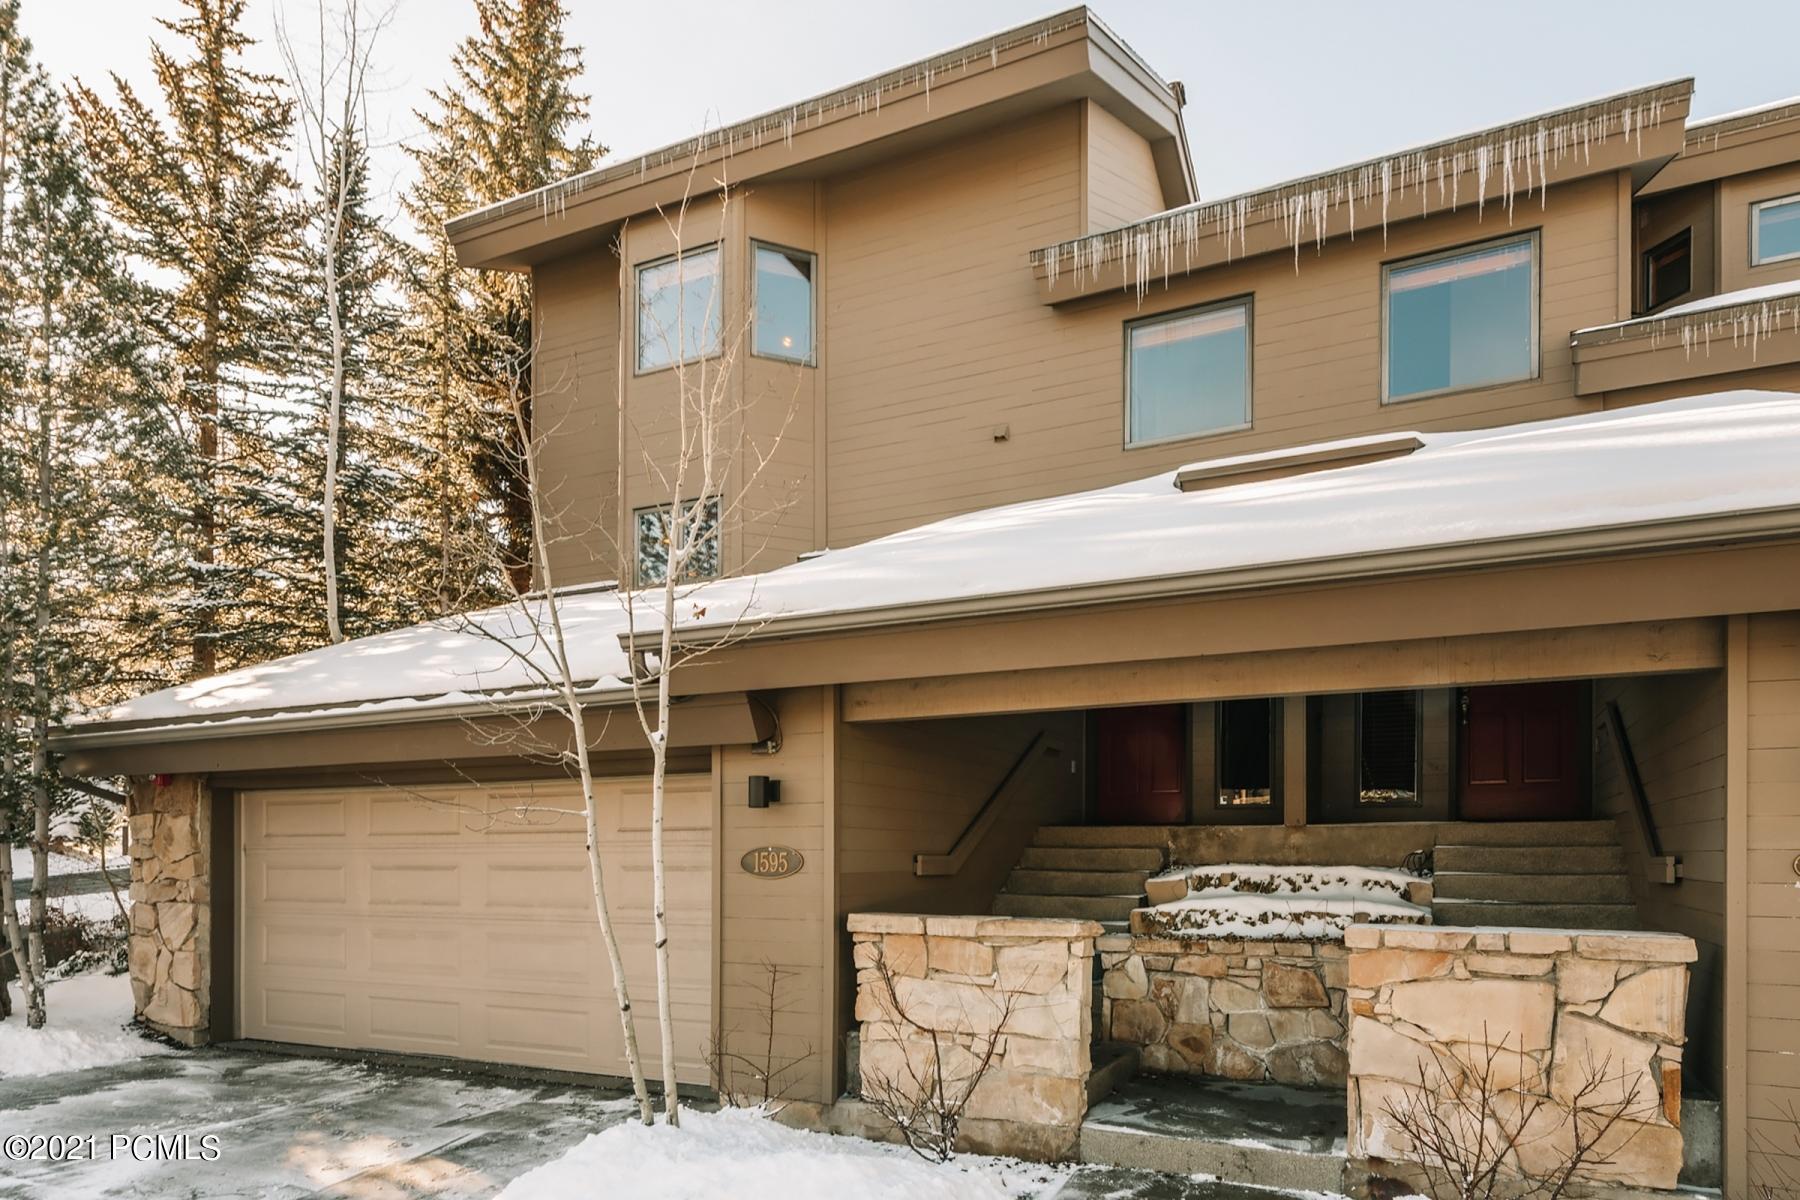 1595 Lakeside Circle, Park City, Utah 84060, 3 Bedrooms Bedrooms, ,3 BathroomsBathrooms,Condominium,For Sale,Lakeside,12100078